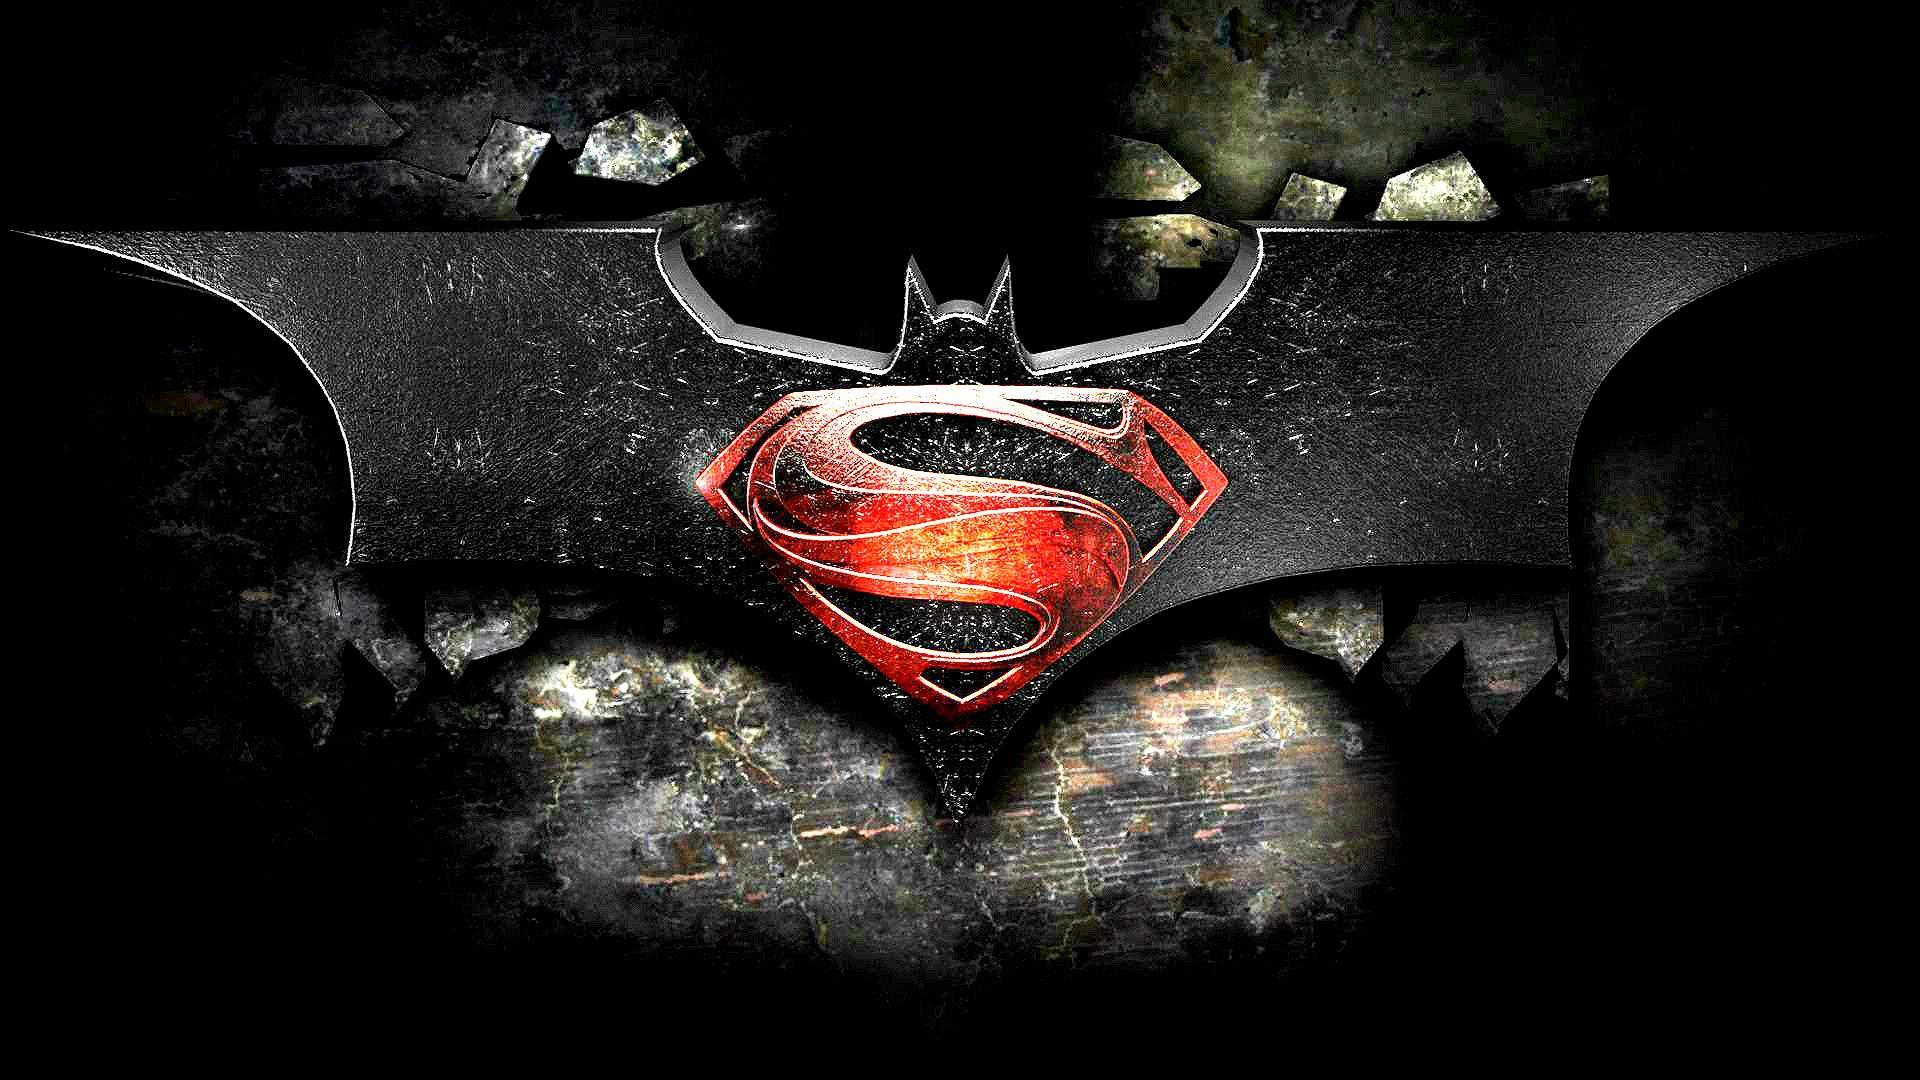 evil superman wallpaper hd - photo #18